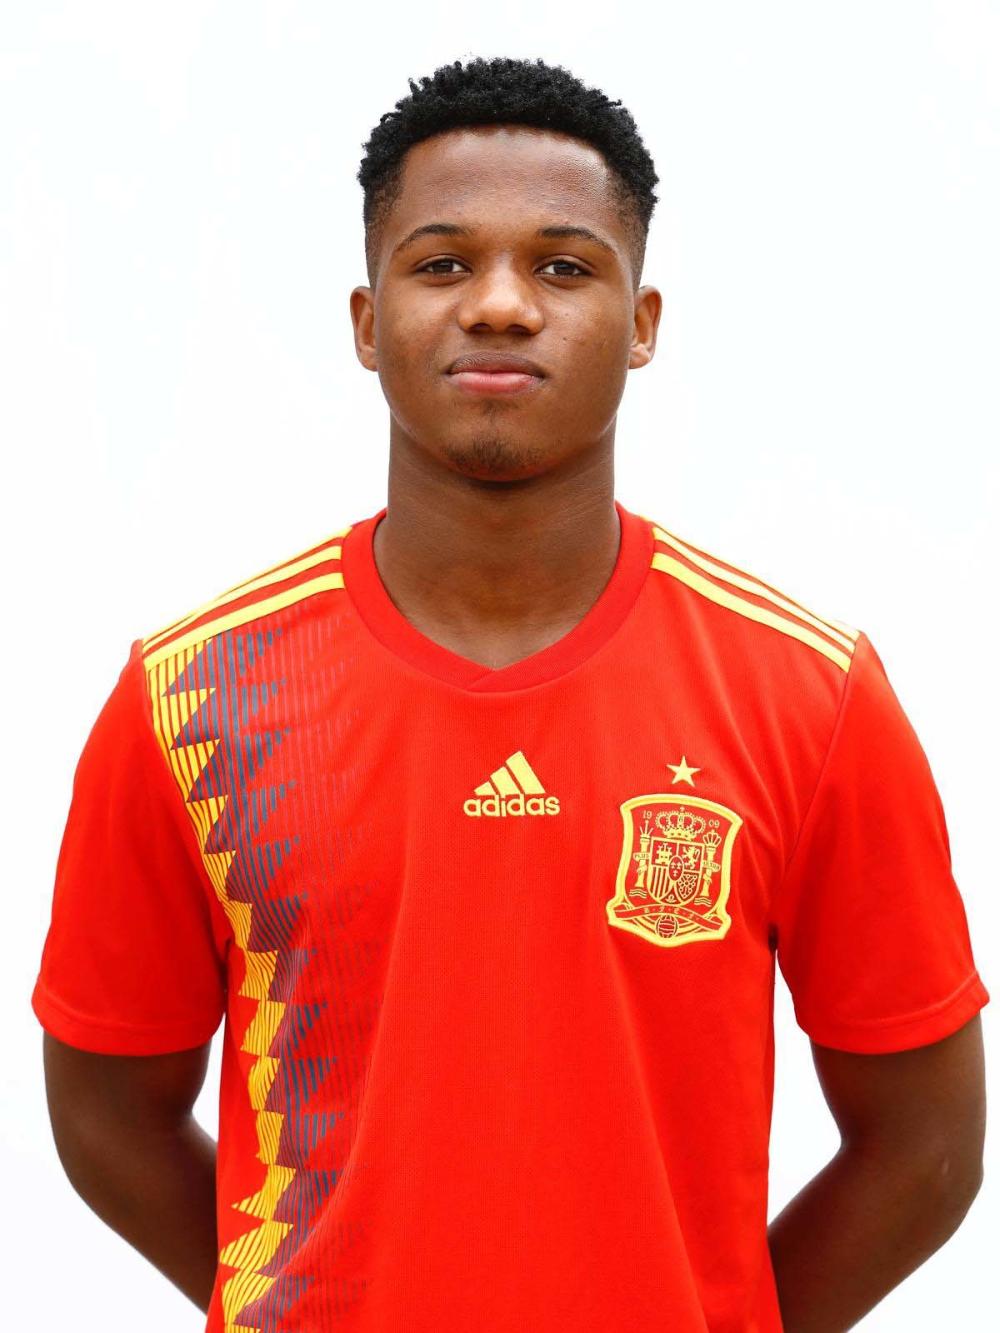 Seleccion Espanola Ansu Fati Ya Posa Con La Camiseta De Espana Marca Com Seleccion Espanola De Futbol Futbol Europeo Futbol